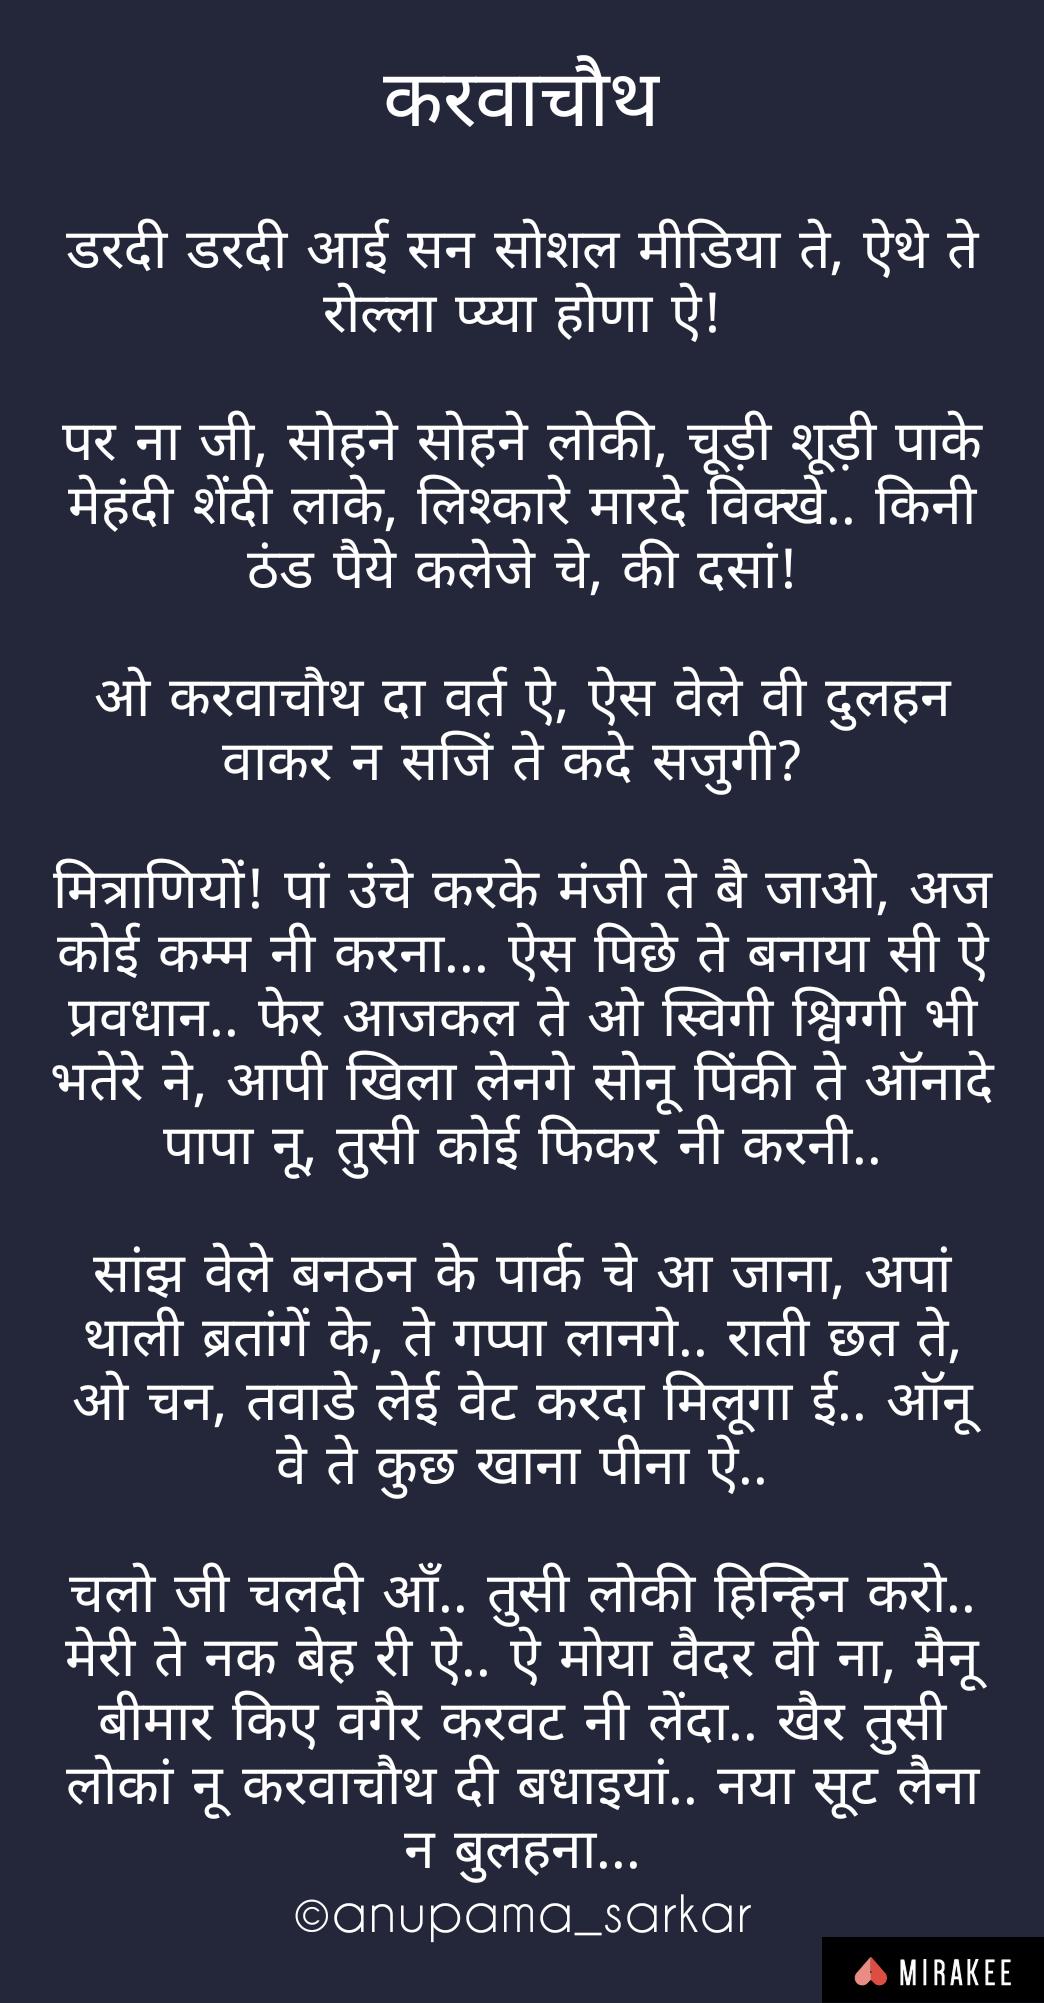 Karvachauth